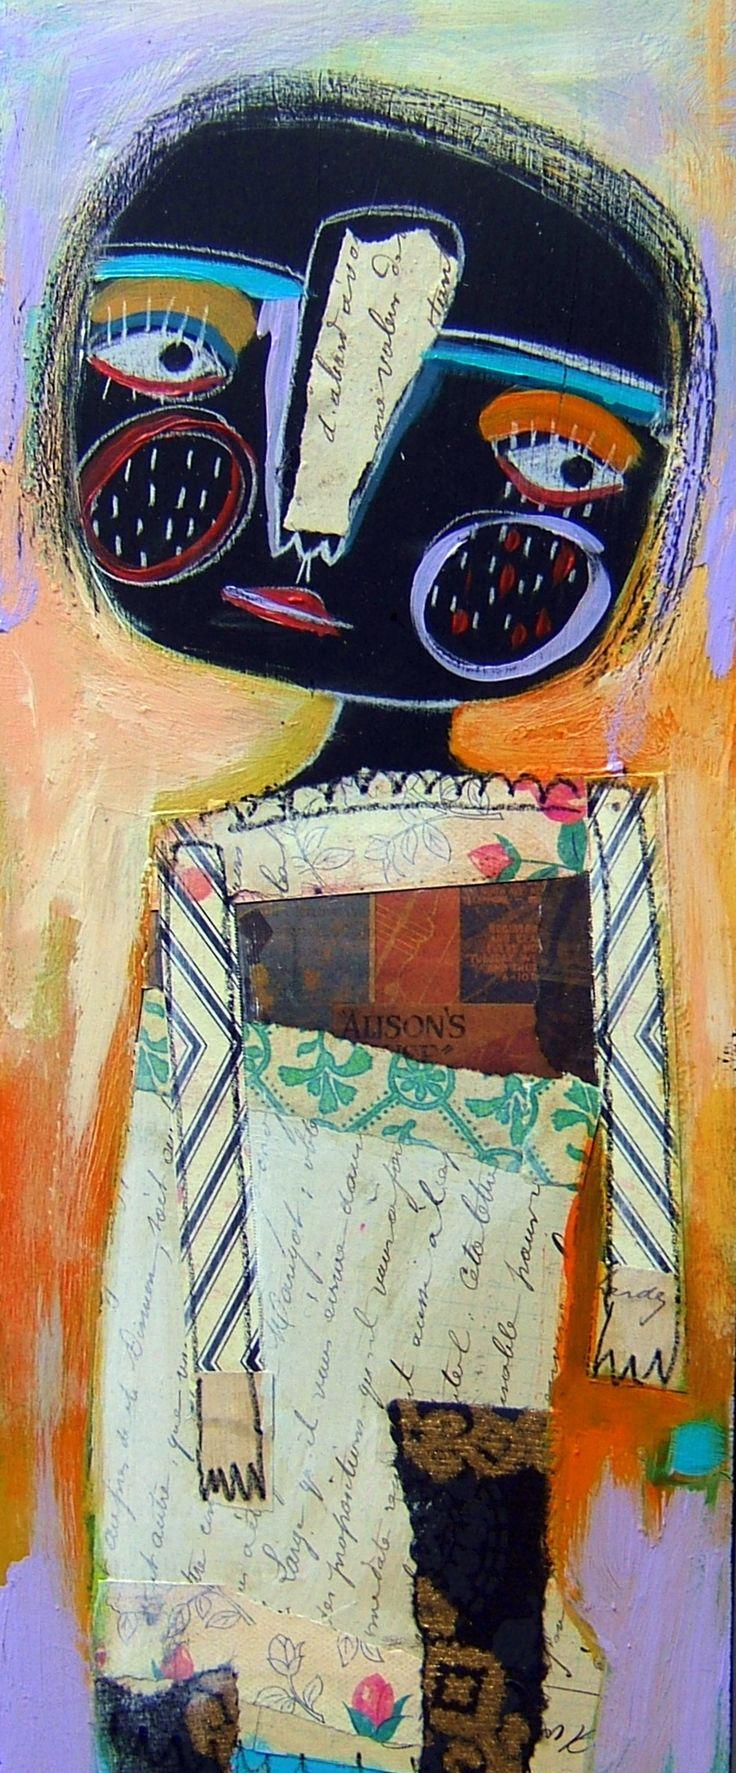 Wood box mix media collage Her name is Ophelia Tiddlebug